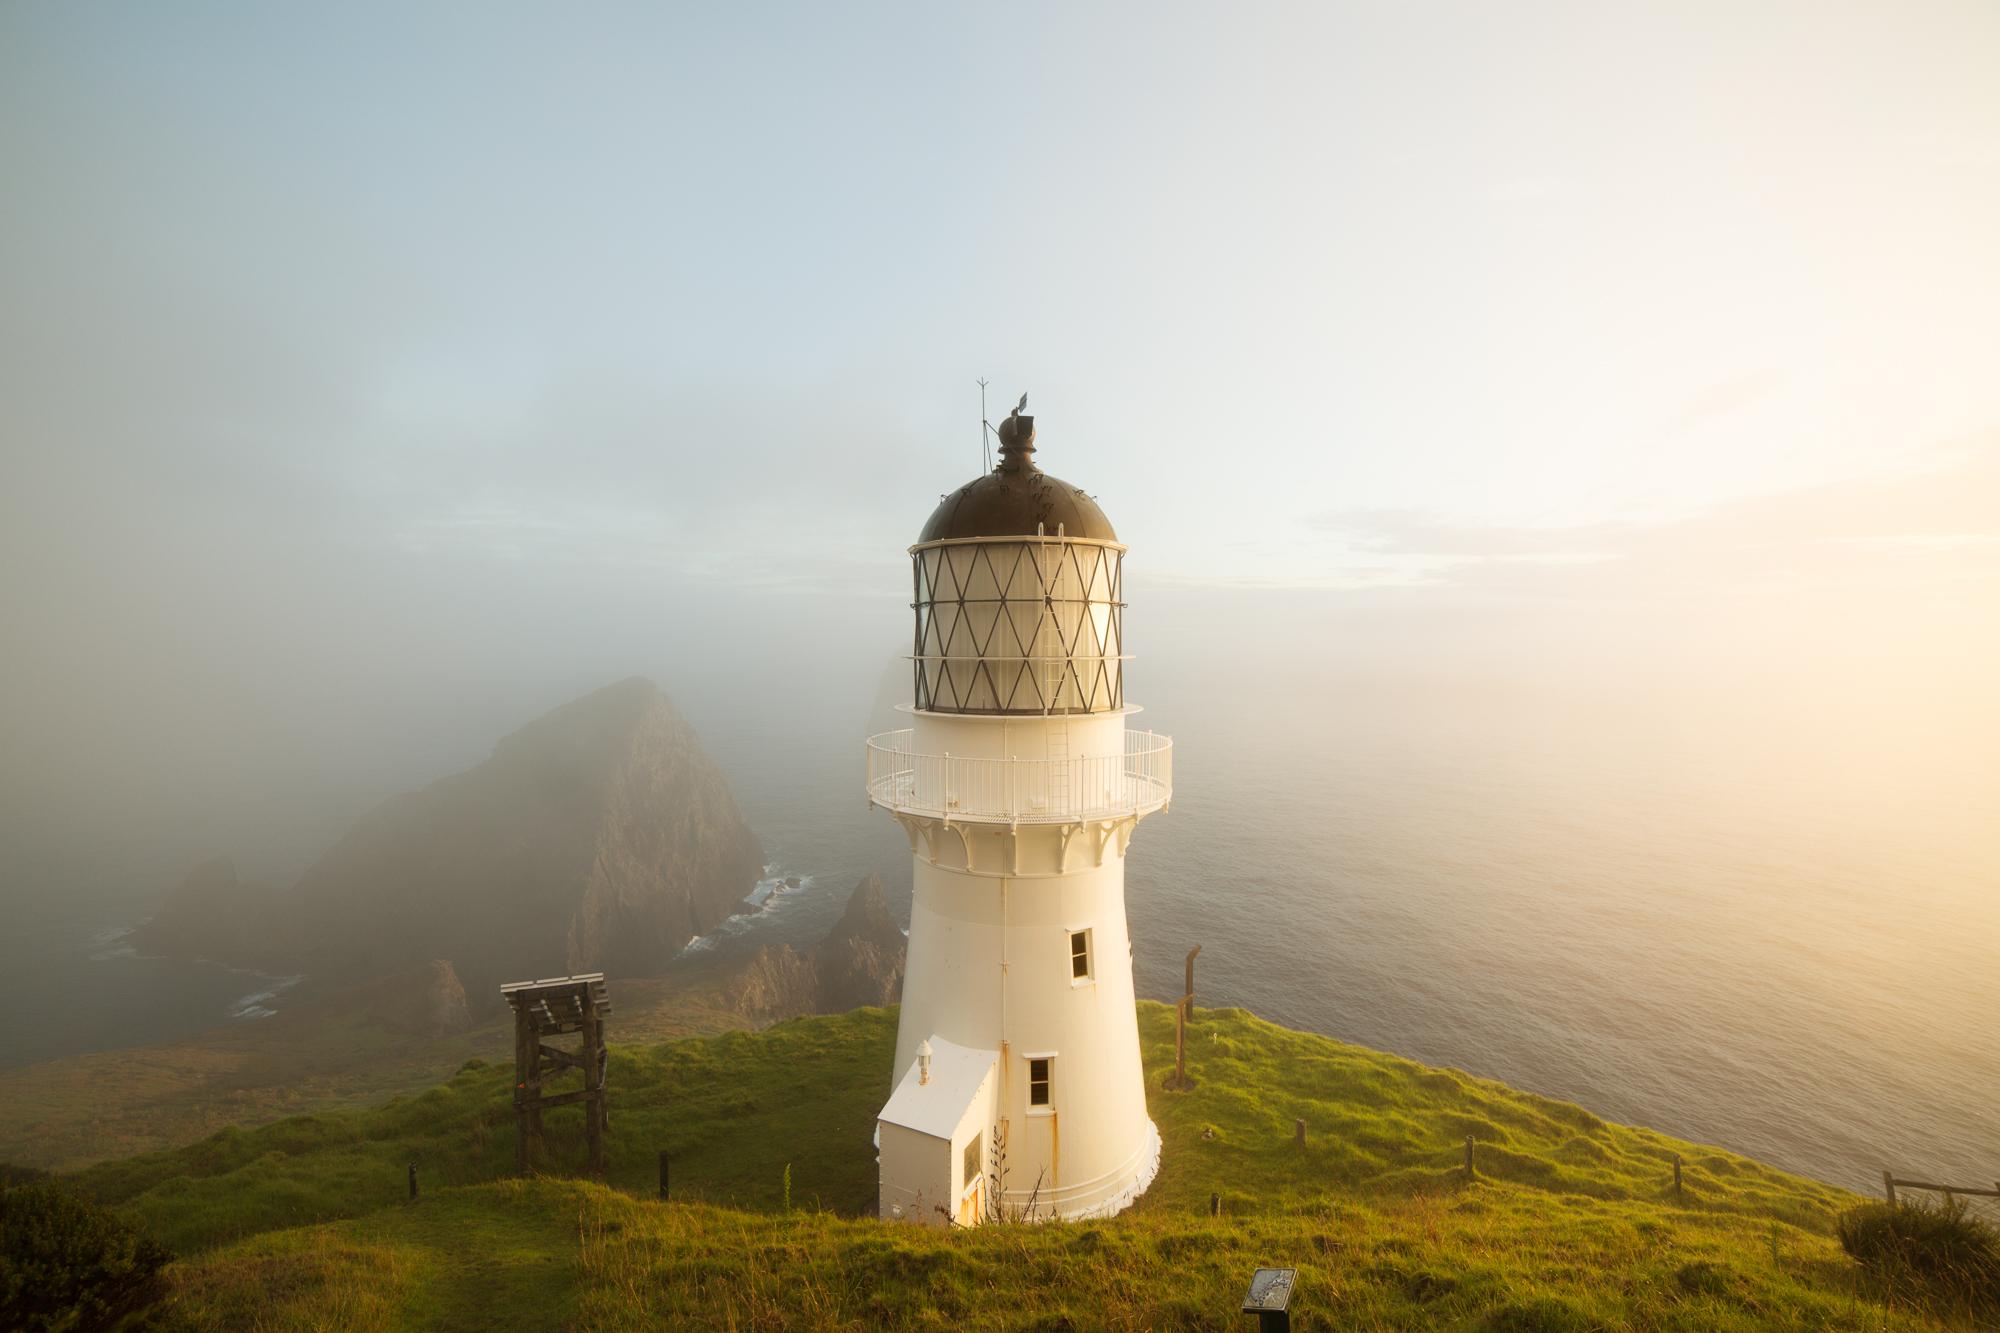 16-Bec_Kilpatrick_Photography_New_ZealandXXX_7336